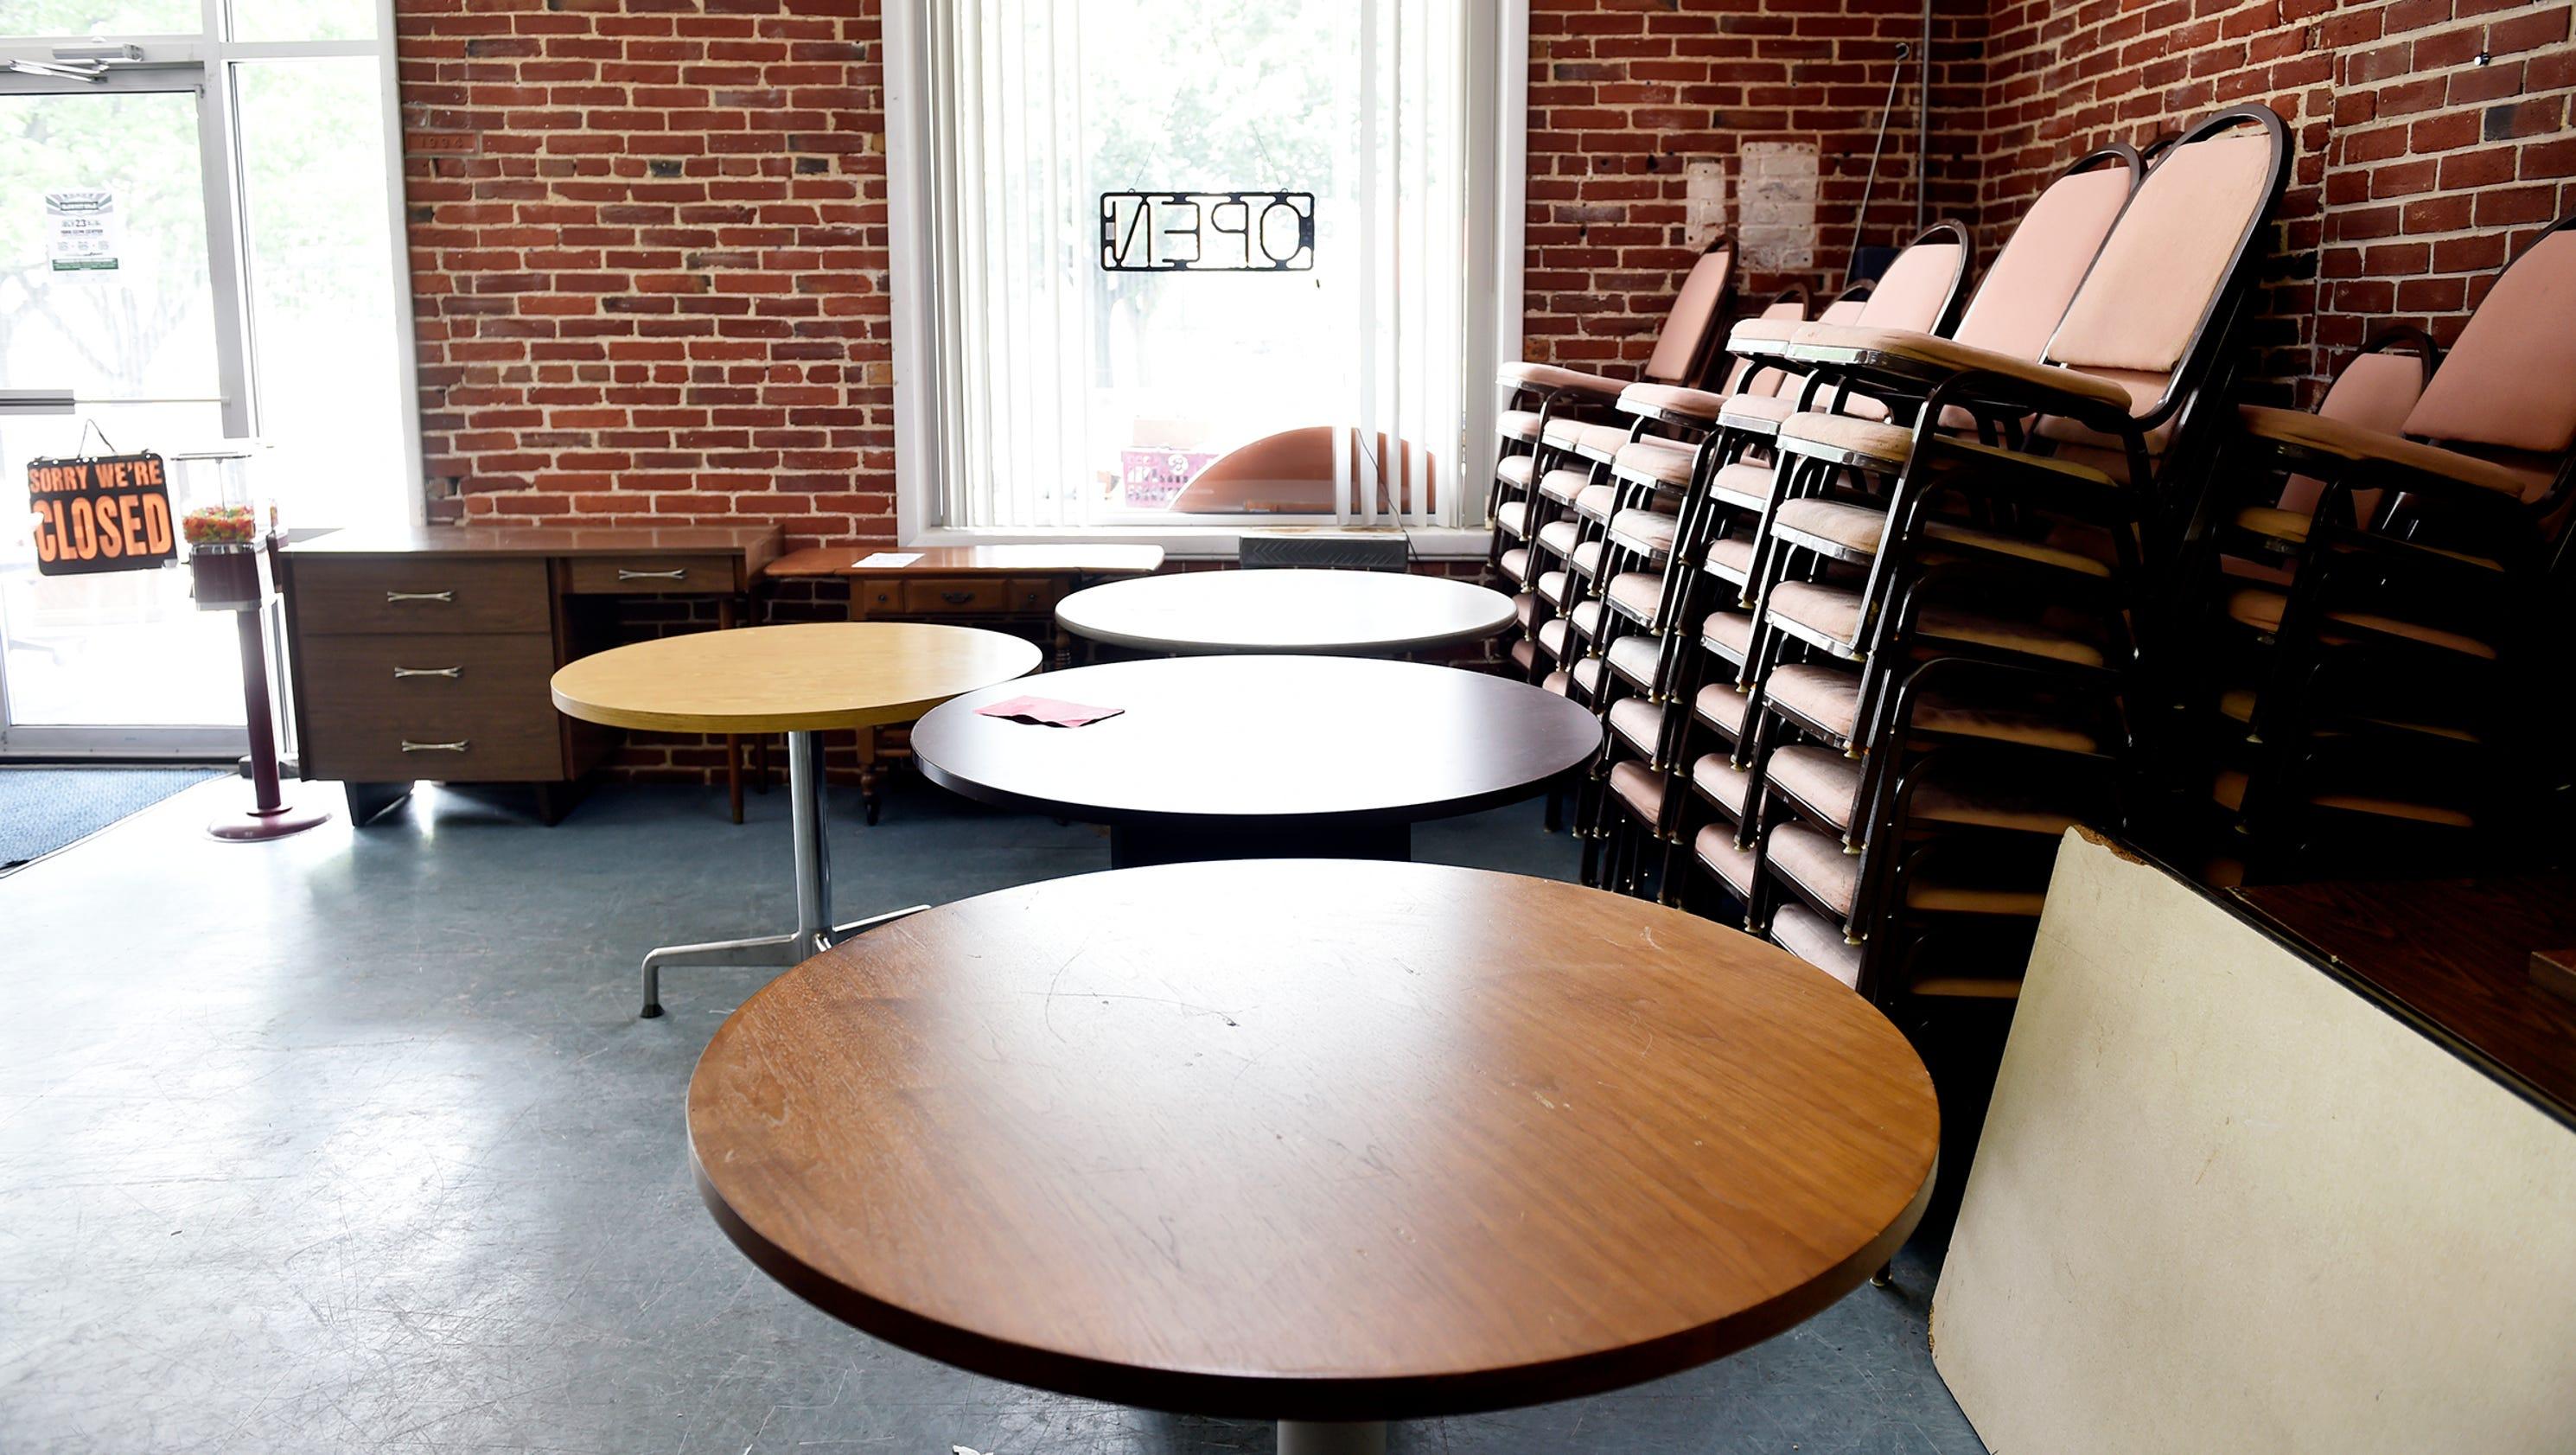 s Discount furniture in York